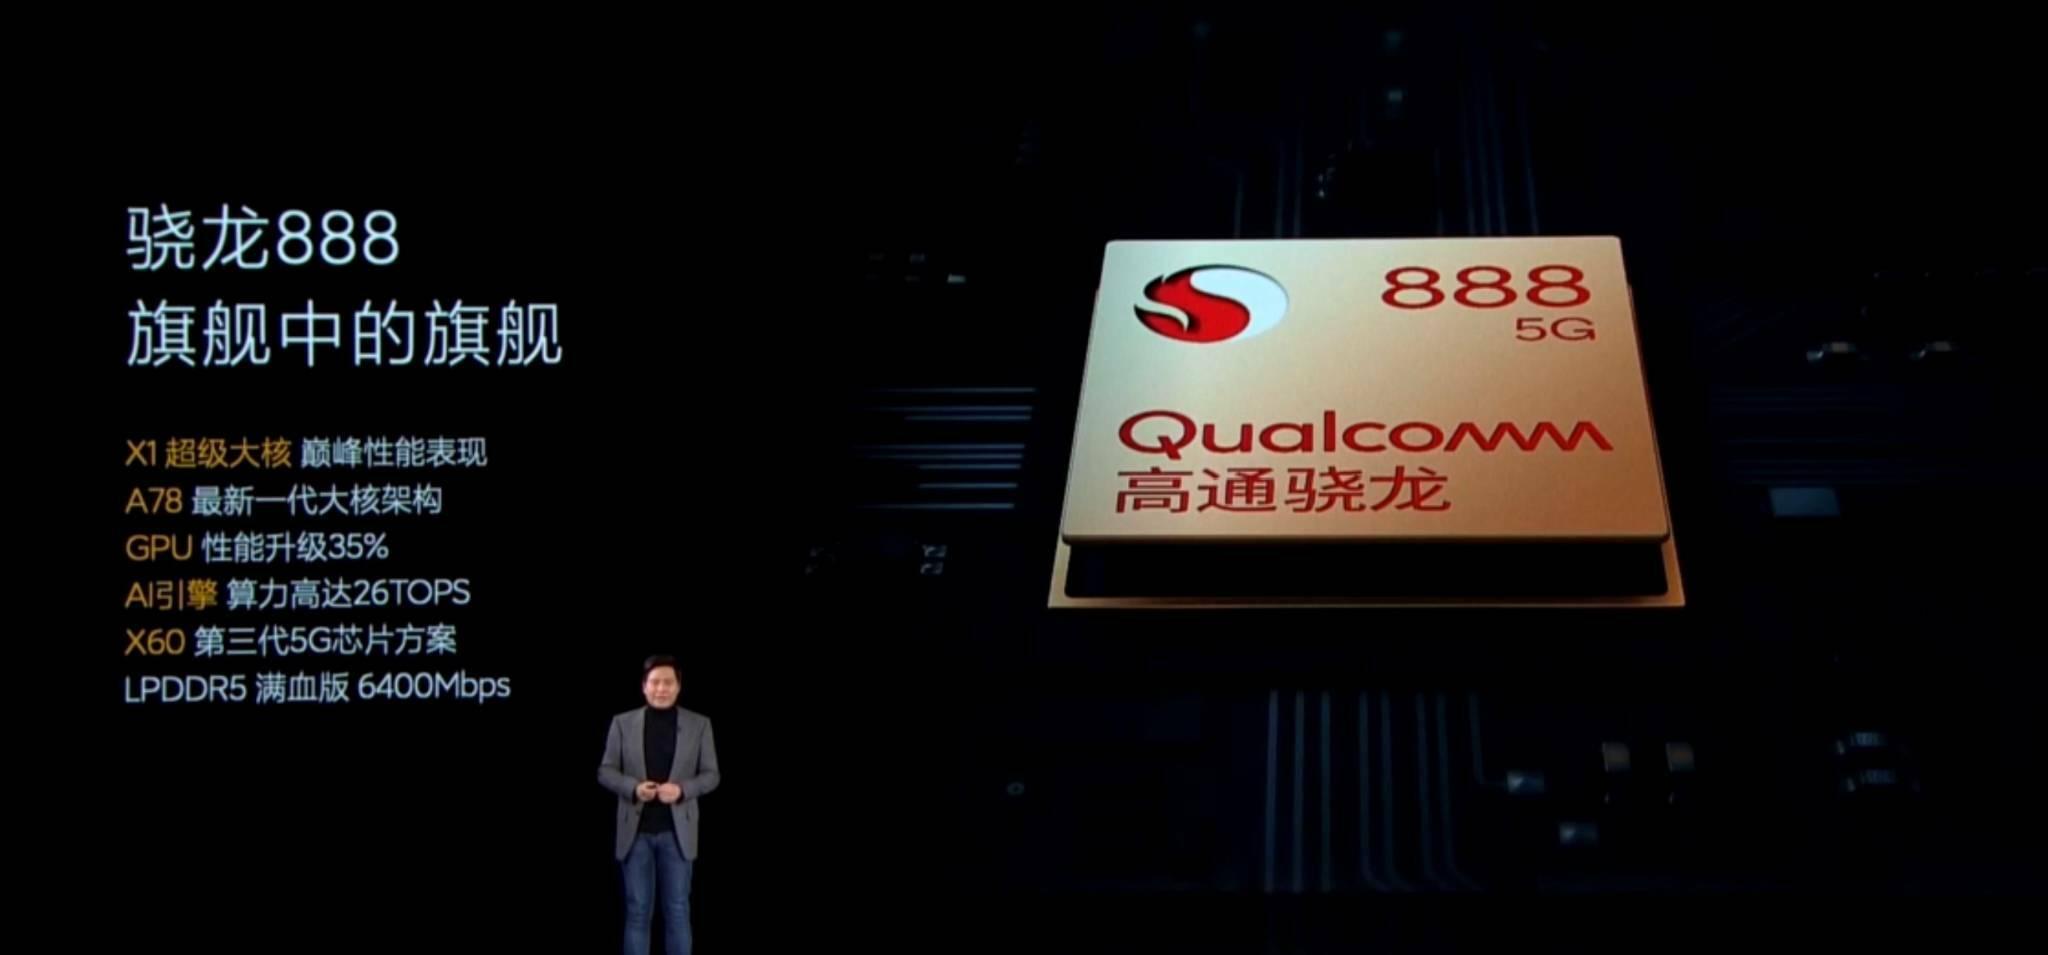 Xiaomi Mi 11 launch event china